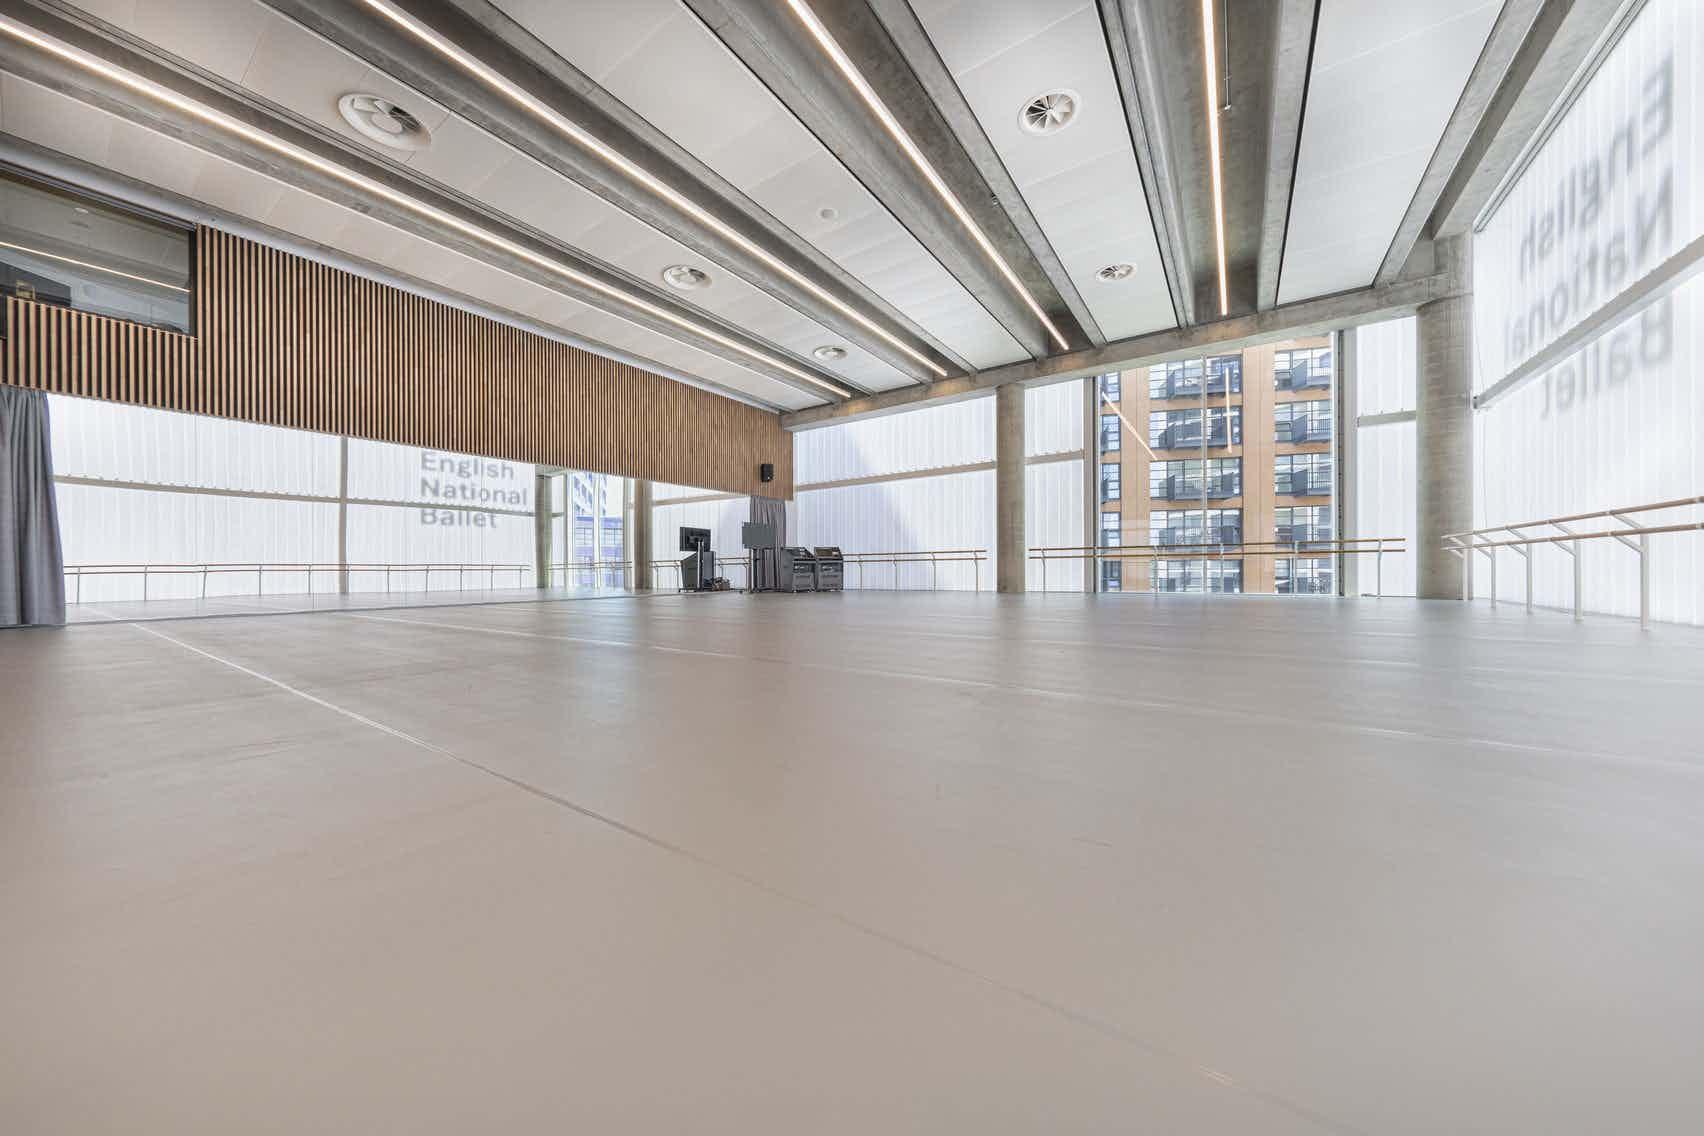 Linden Studio, English National Ballet